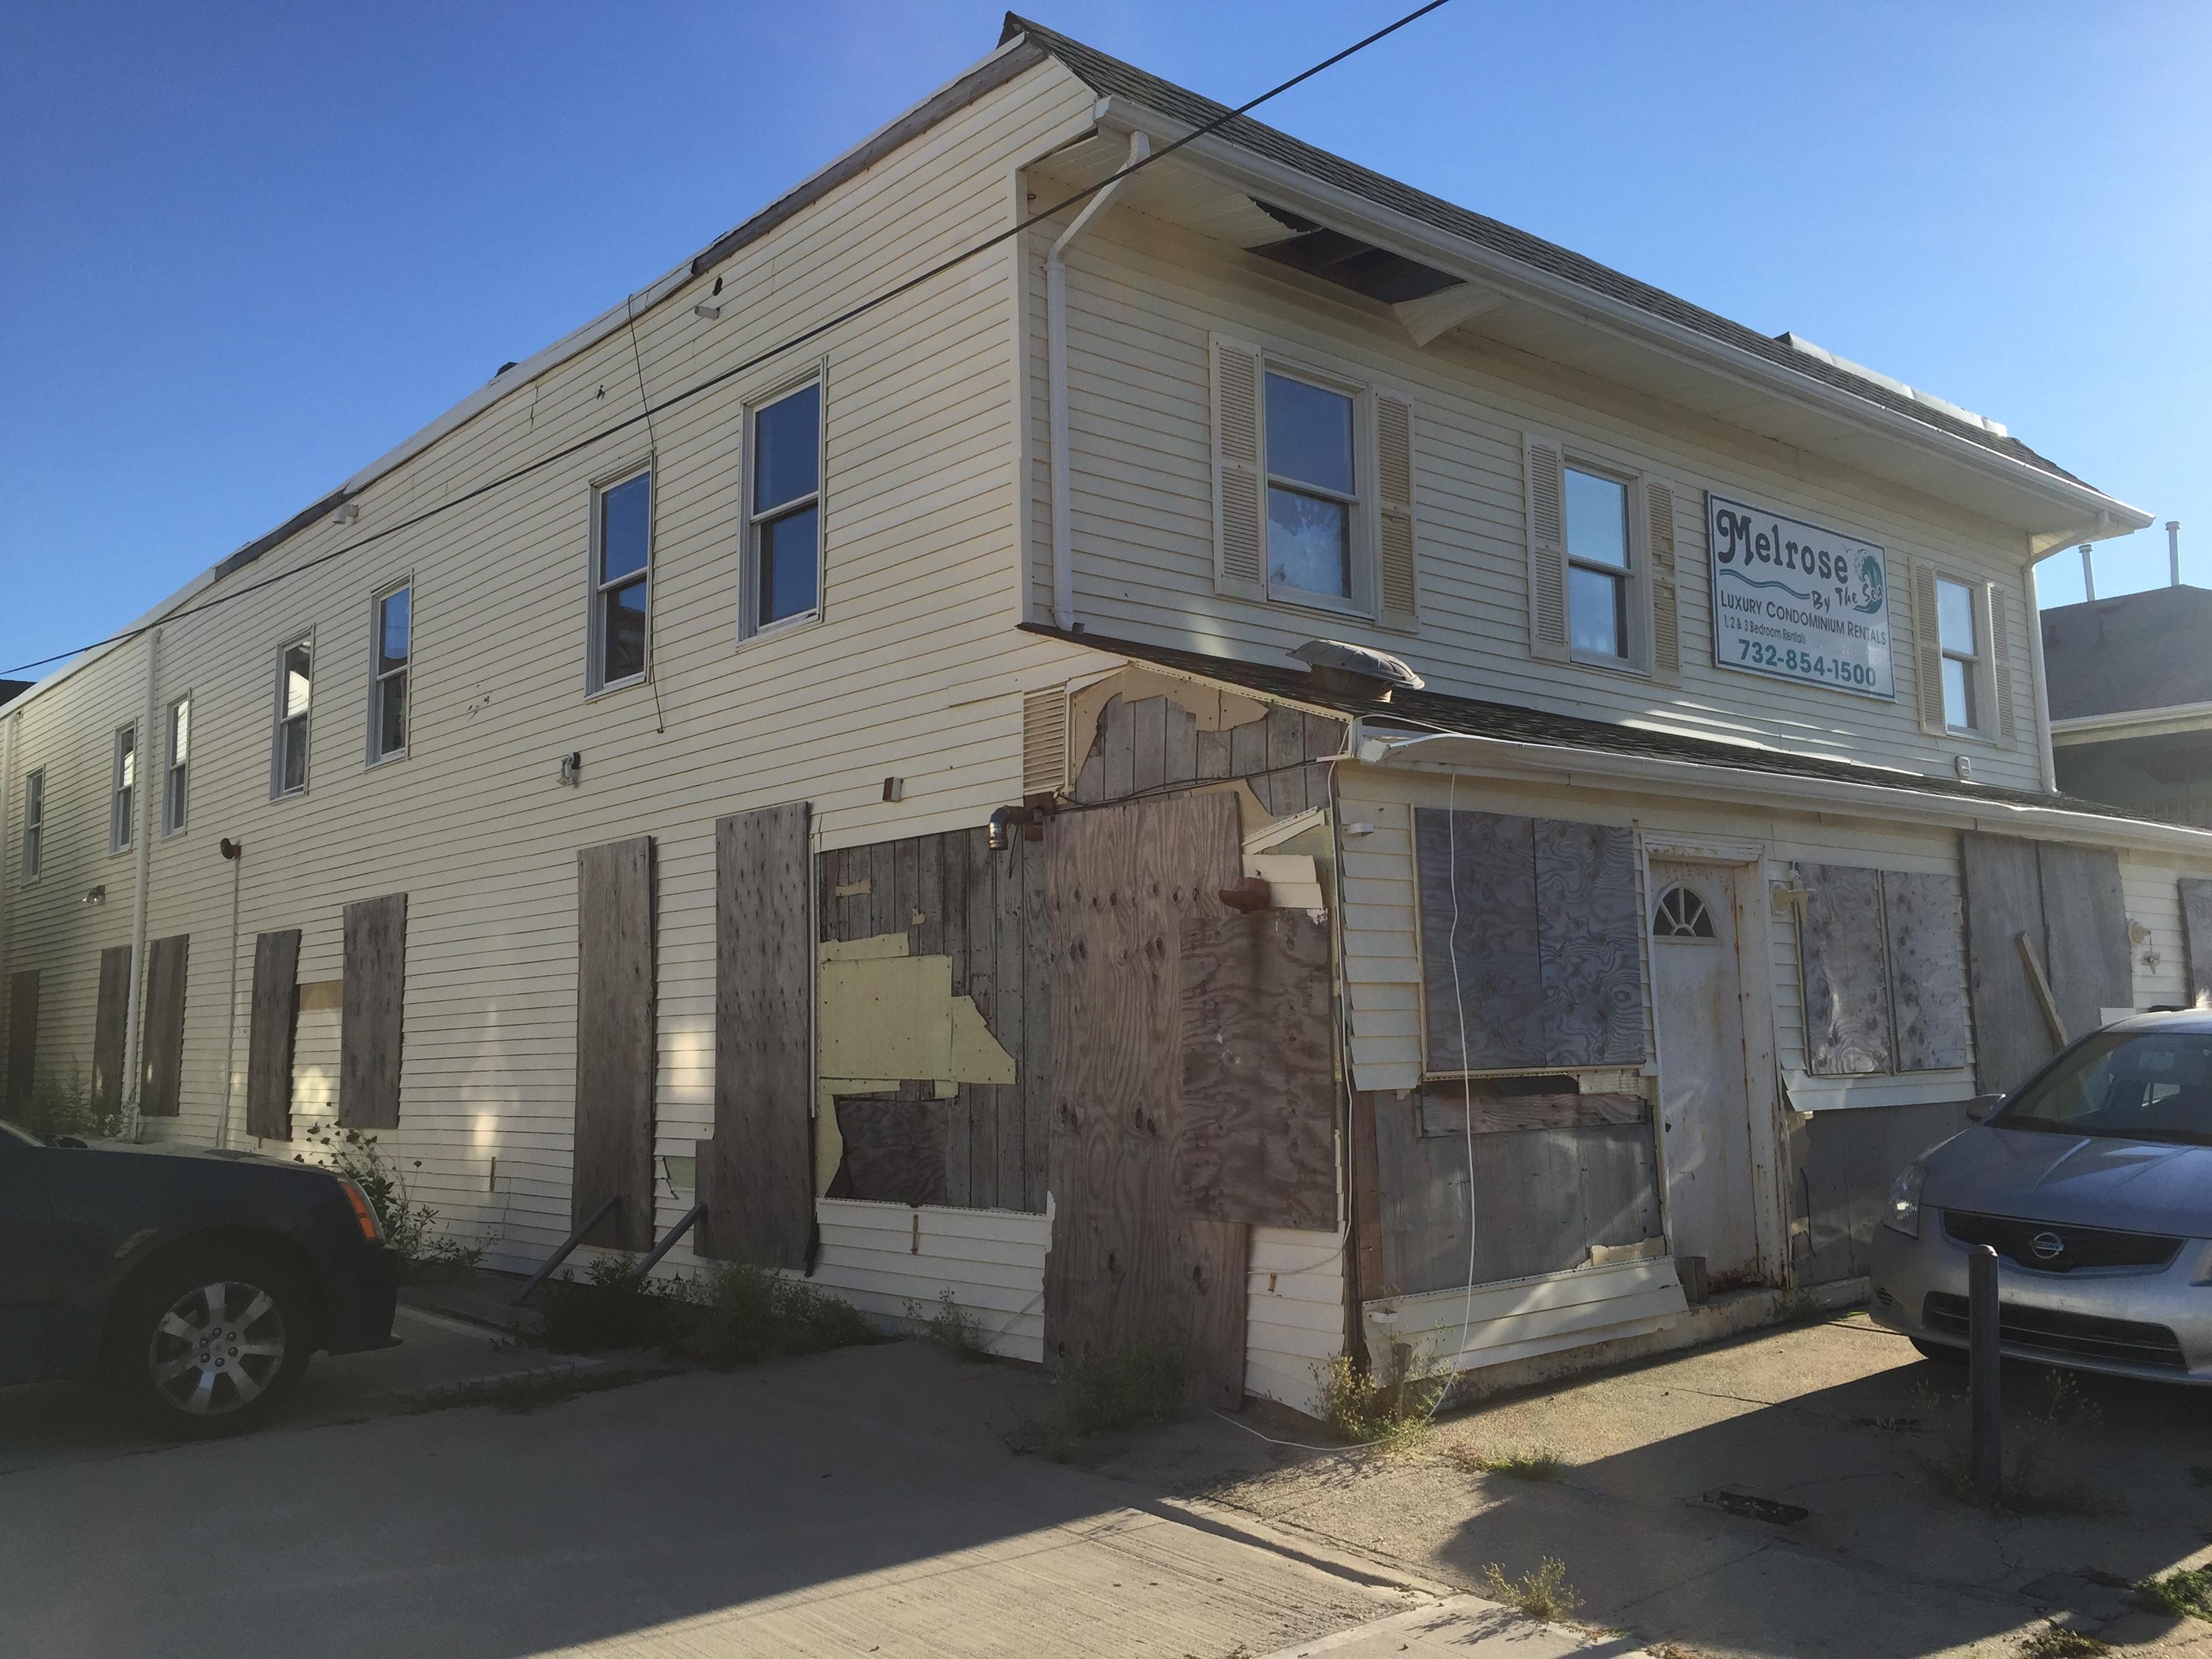 An abandoned rental property on Sampson Avenue in Seaside Heights. (Photo: Rachael Bowen)